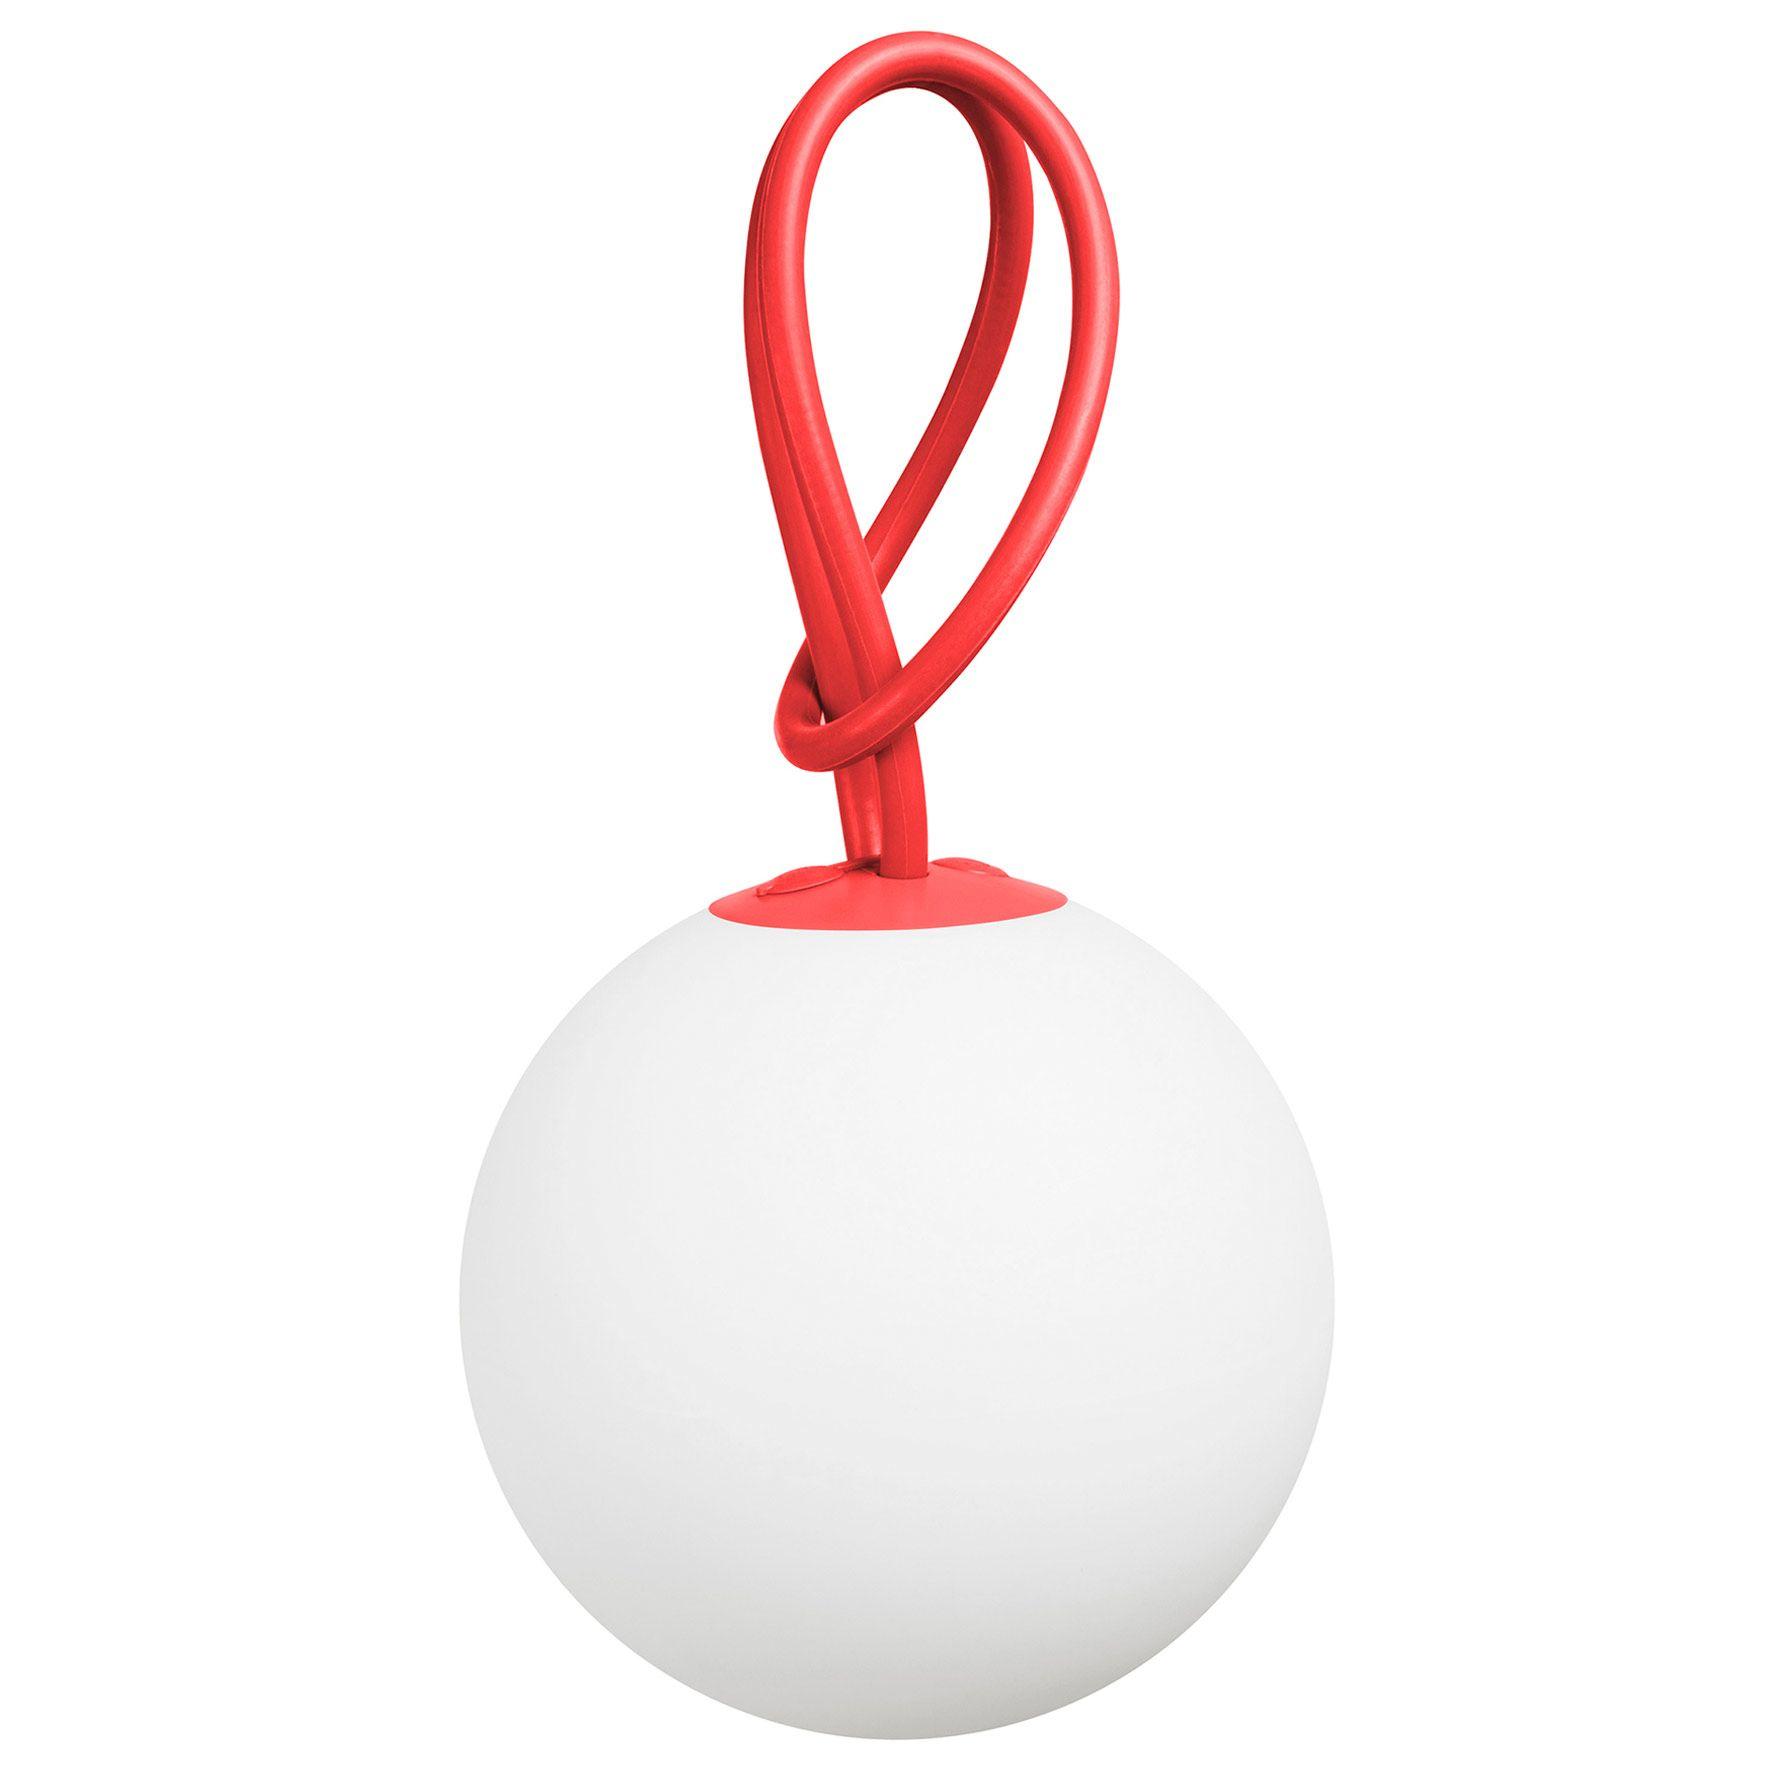 Bolleke Outdoor Portable Light By Fatboy Usa Bolleke Taupe In 2020 Portable Light Lamp Hanging Lamp